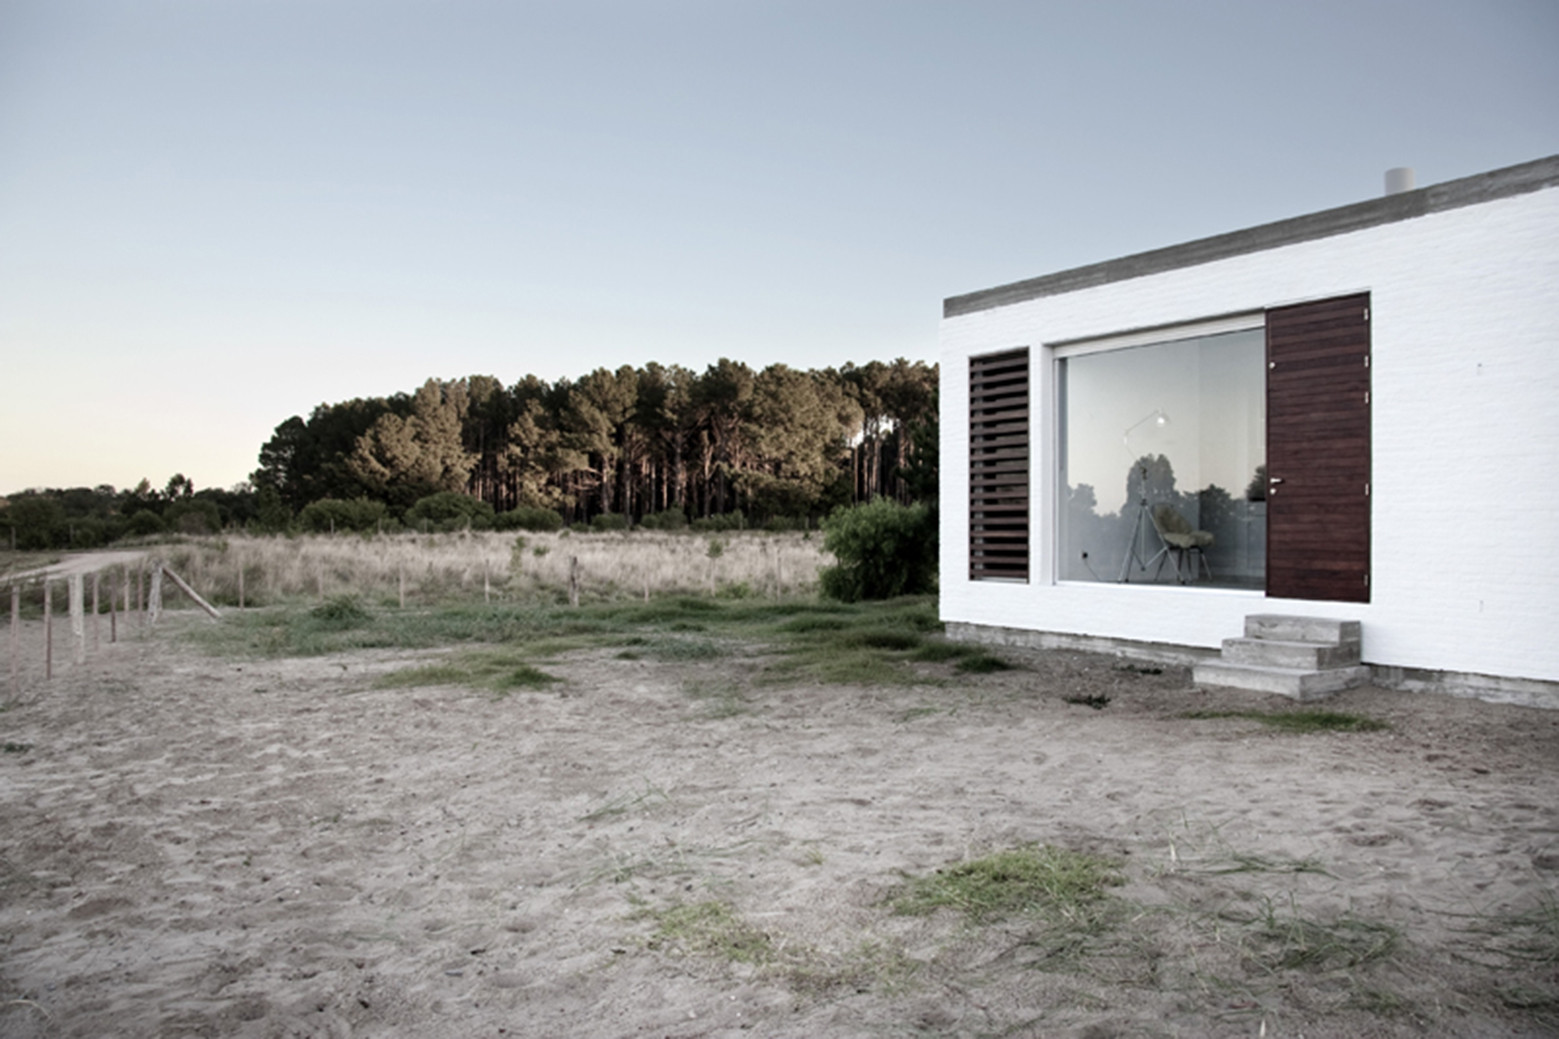 Casa ZAG / Estudio BaBo, © Curro Palacios Taberner